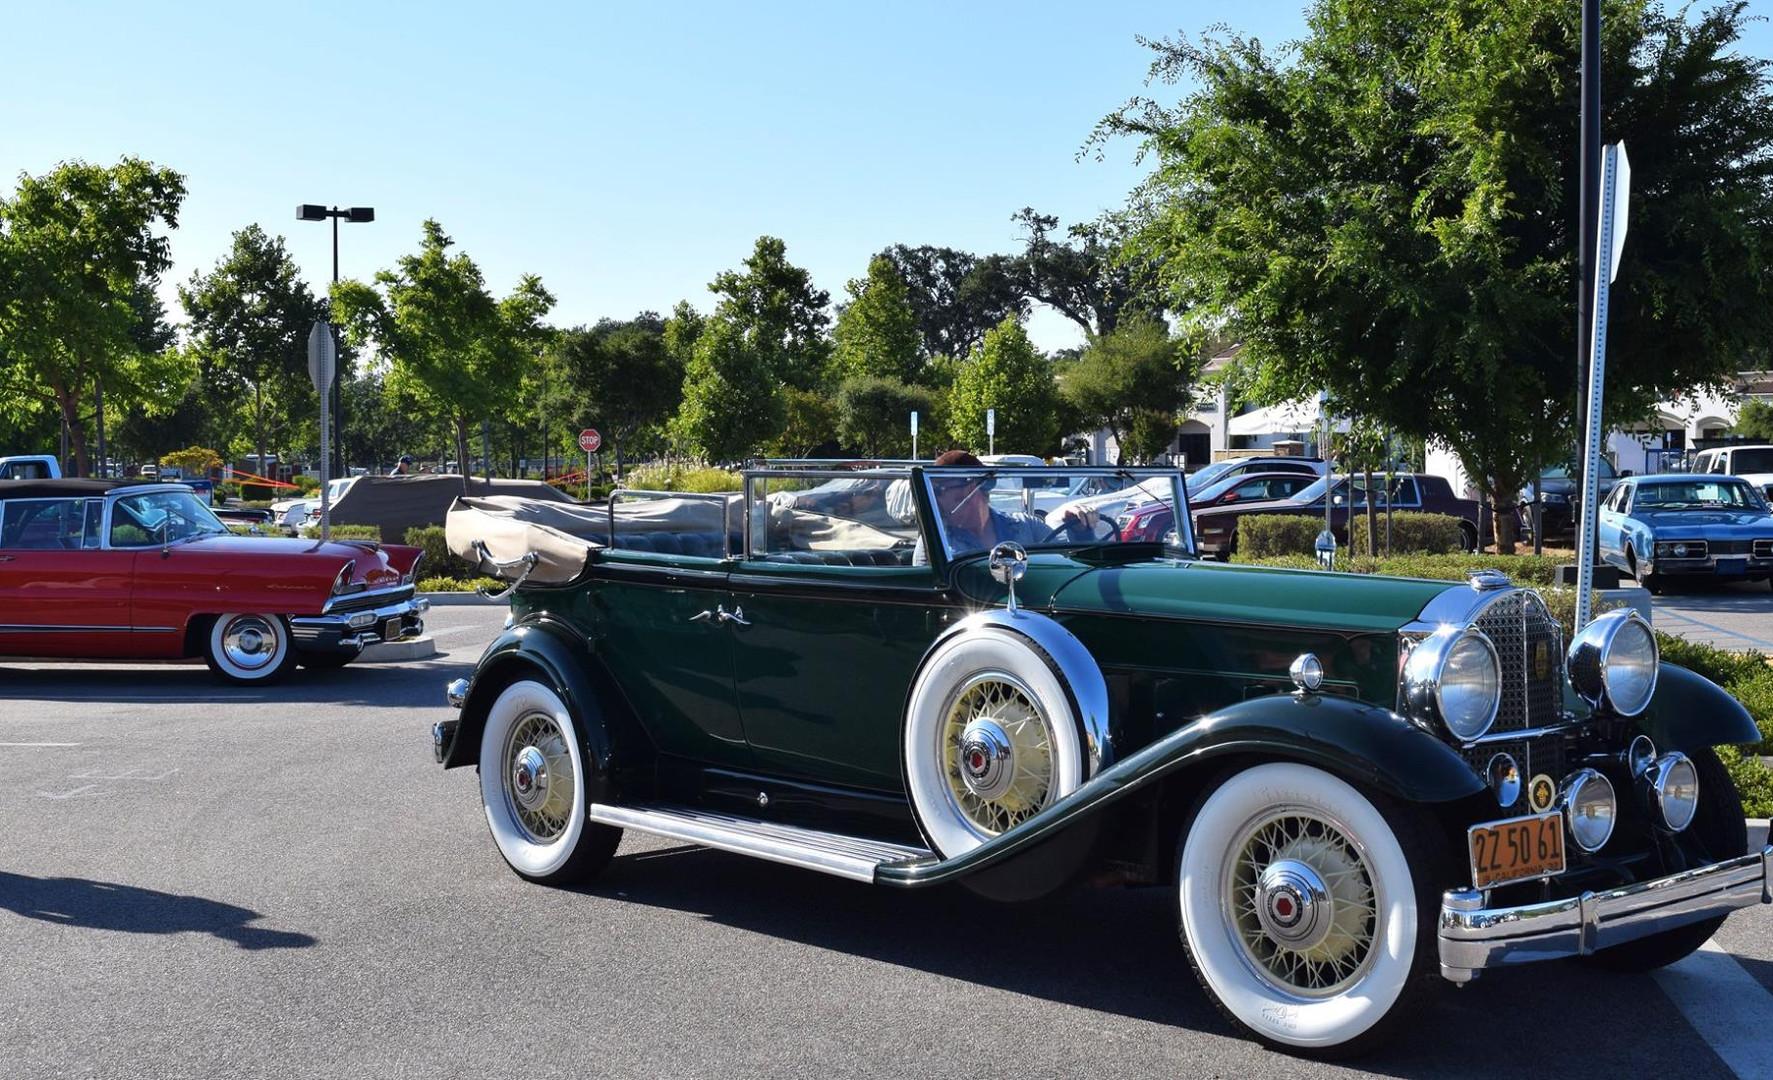 Car Show - Clint and Packard placement.jpg